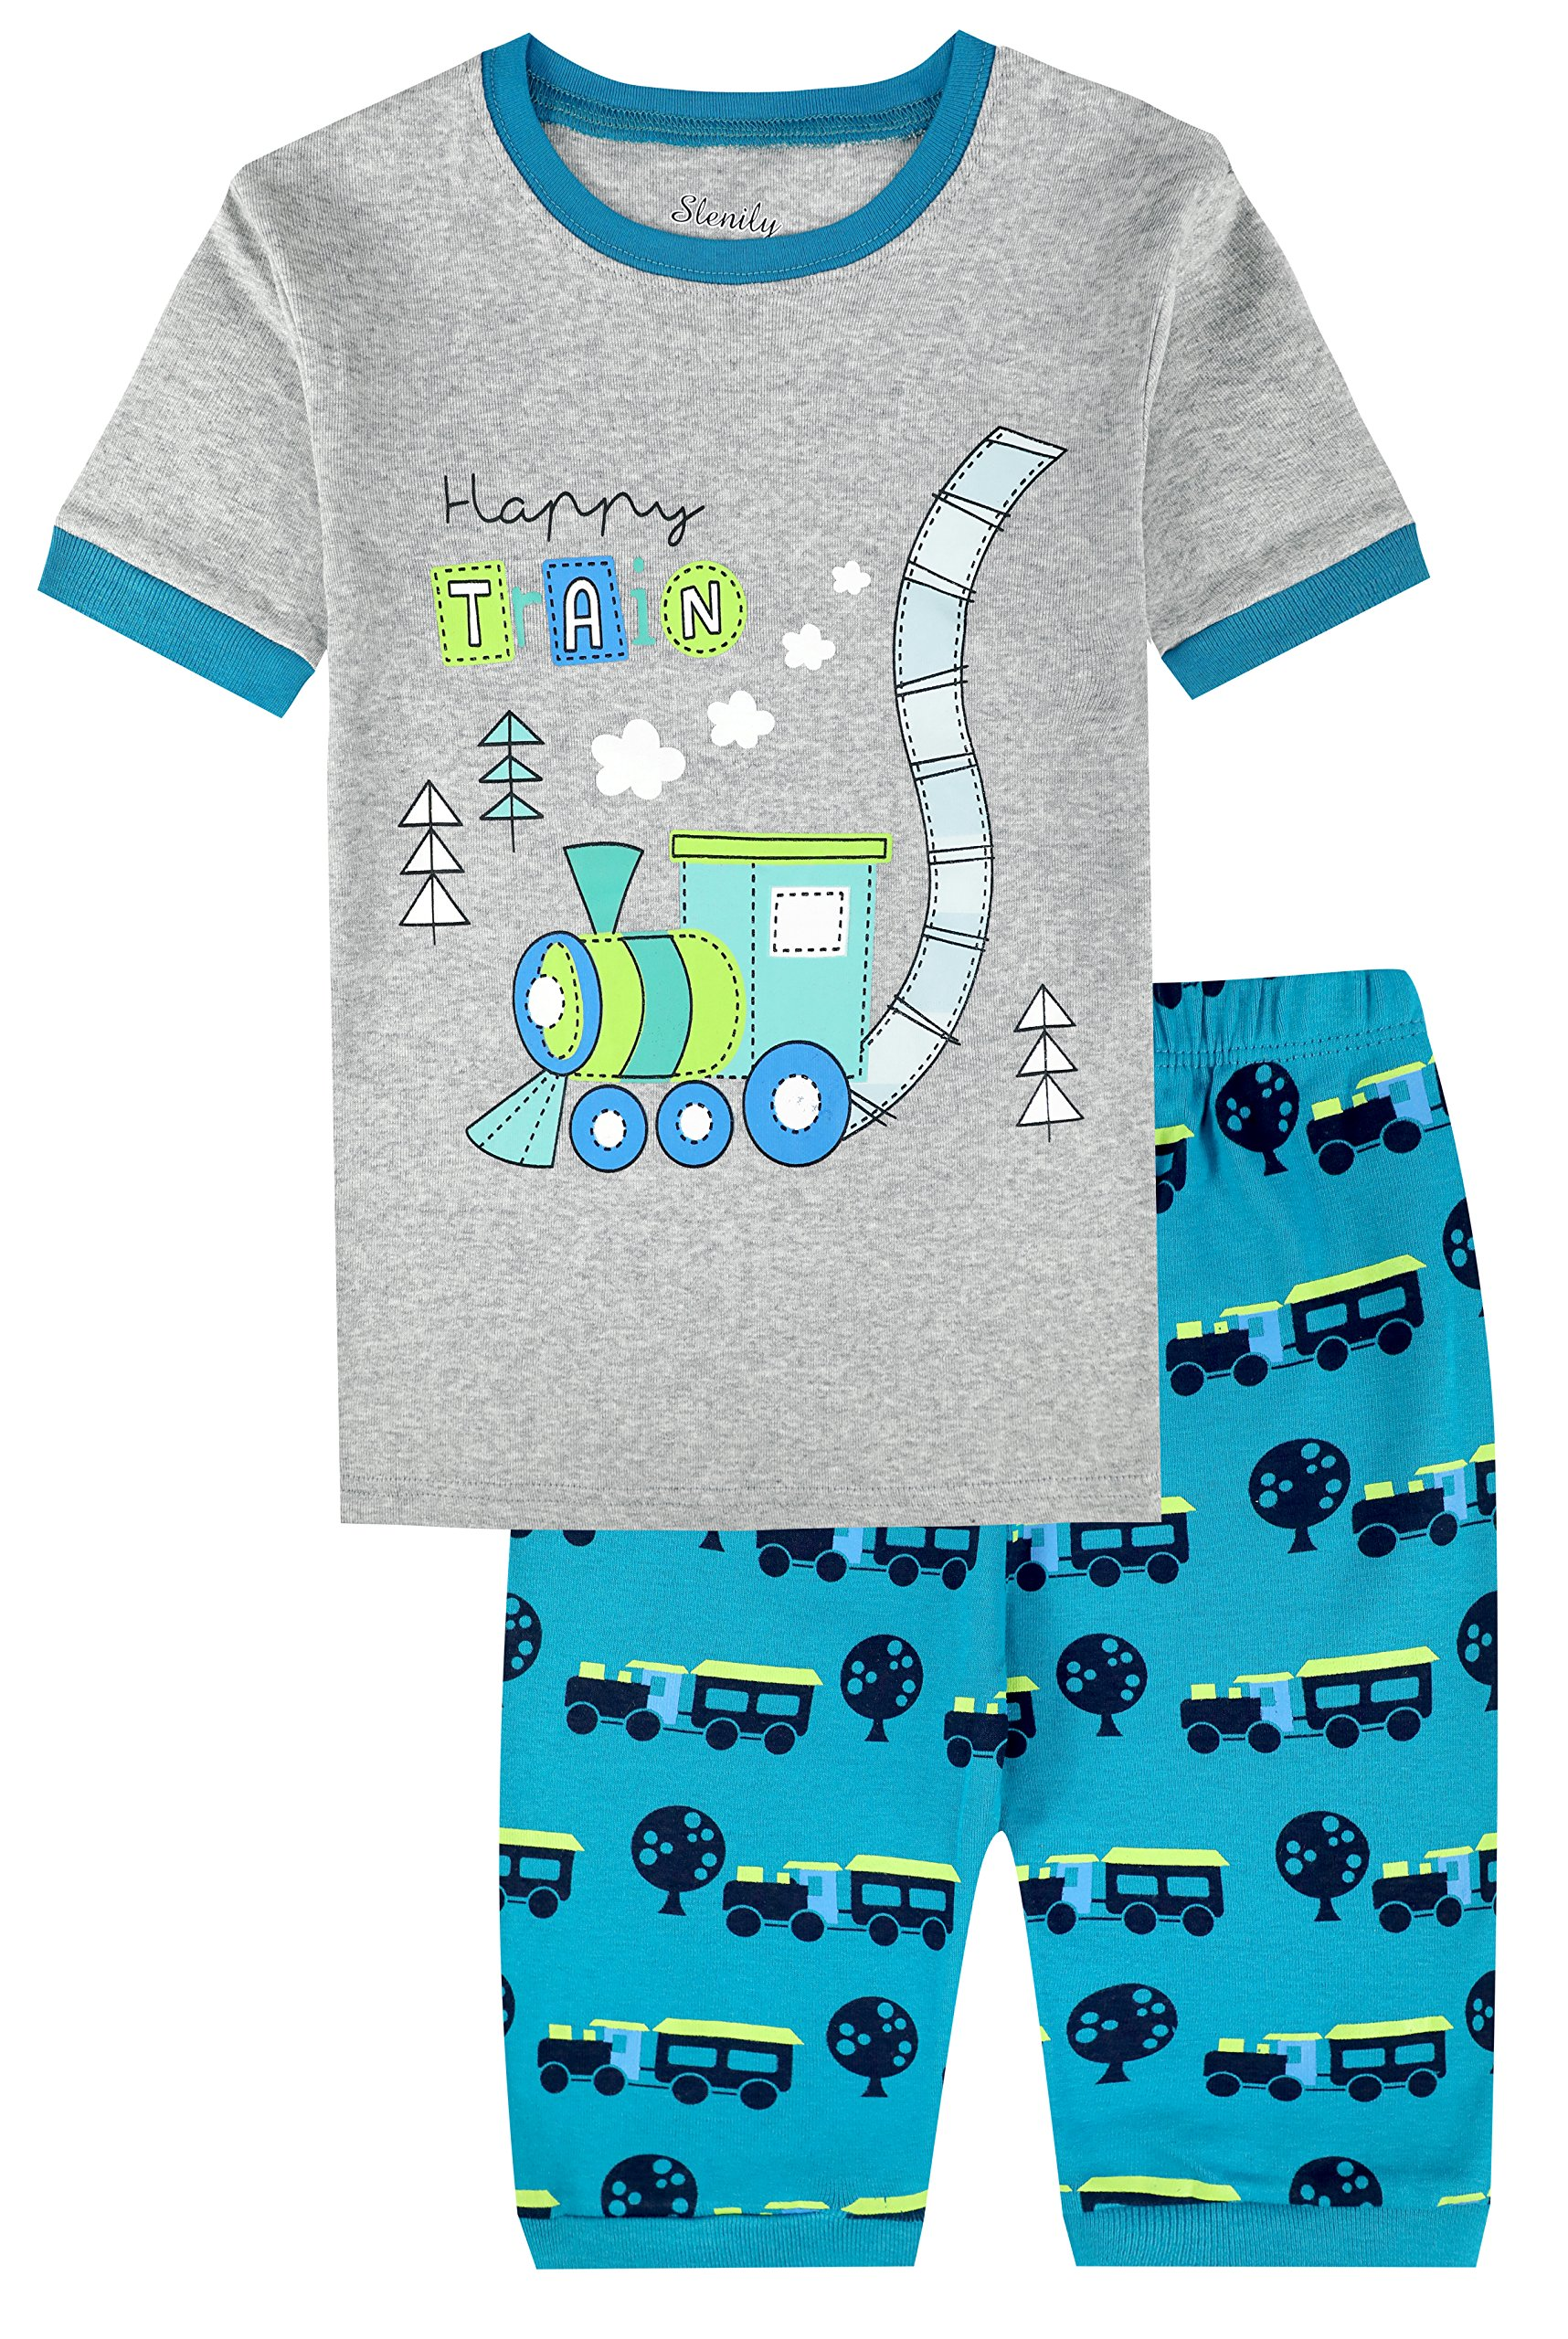 Slenily Boys Pajamas Toddler Sleepwear Clothes T Shirt Pants Set for Kids Size 6